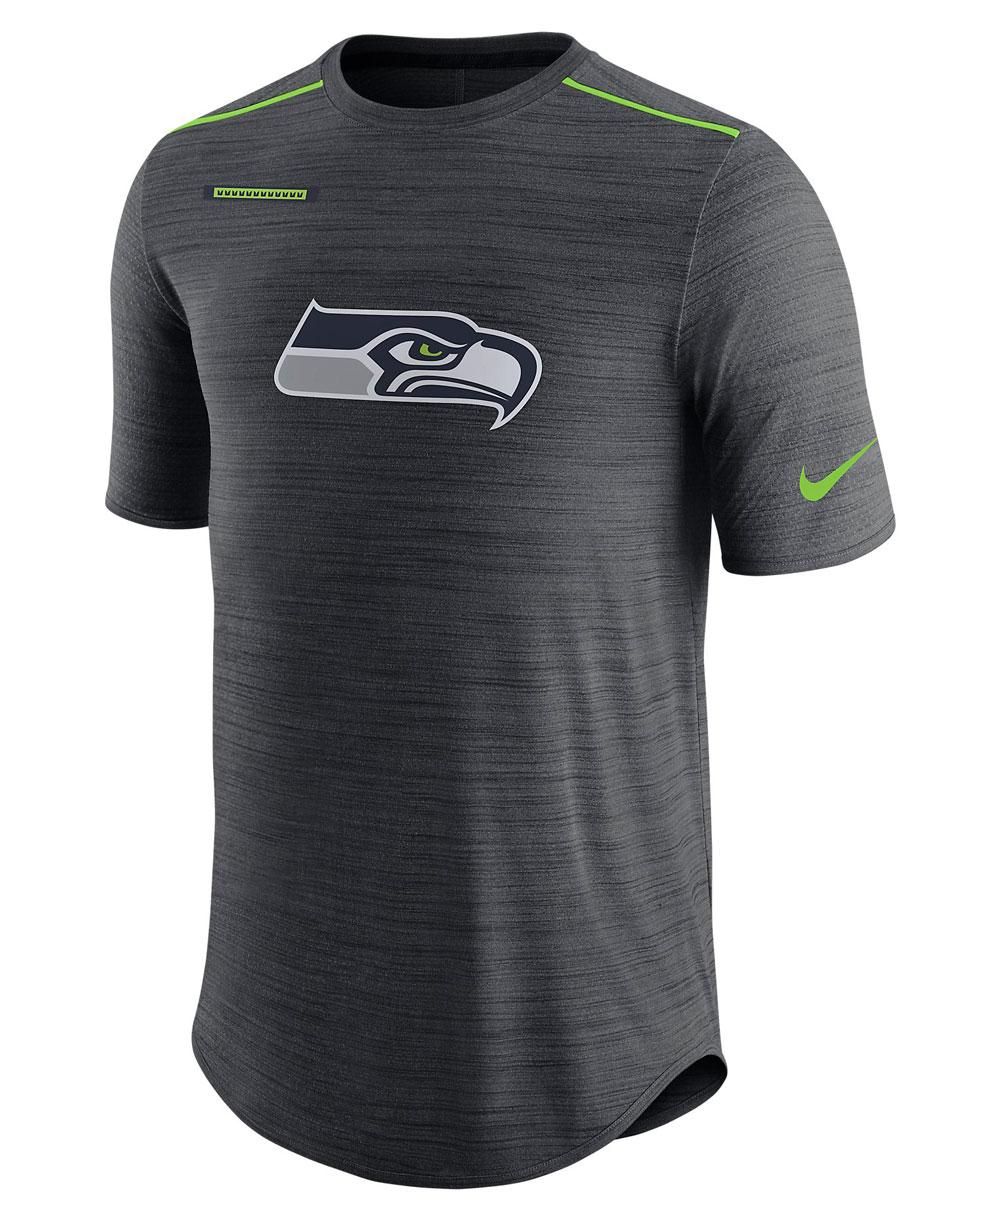 Men's T-Shirt Dry Player NFL Seahawks